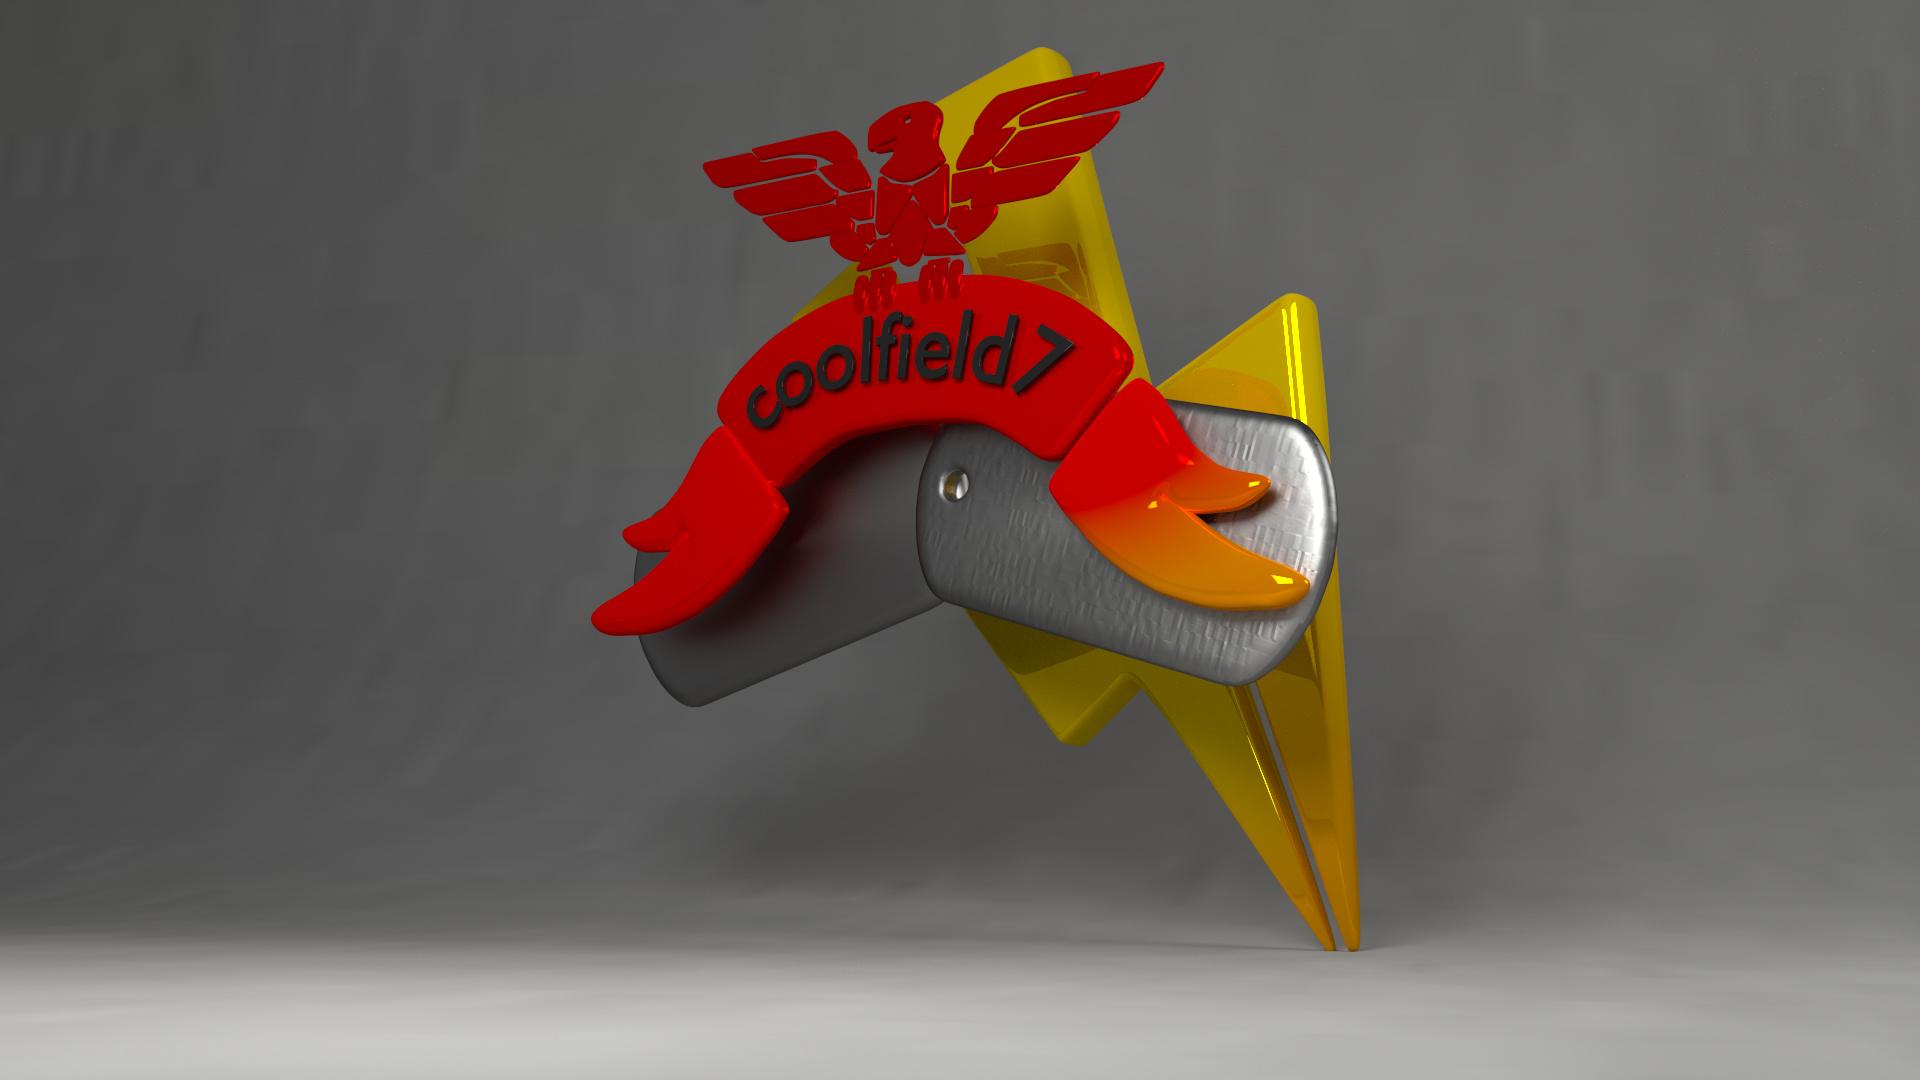 Battlefield 4 3D Emblems - Finished Projects - Blender Artists Community